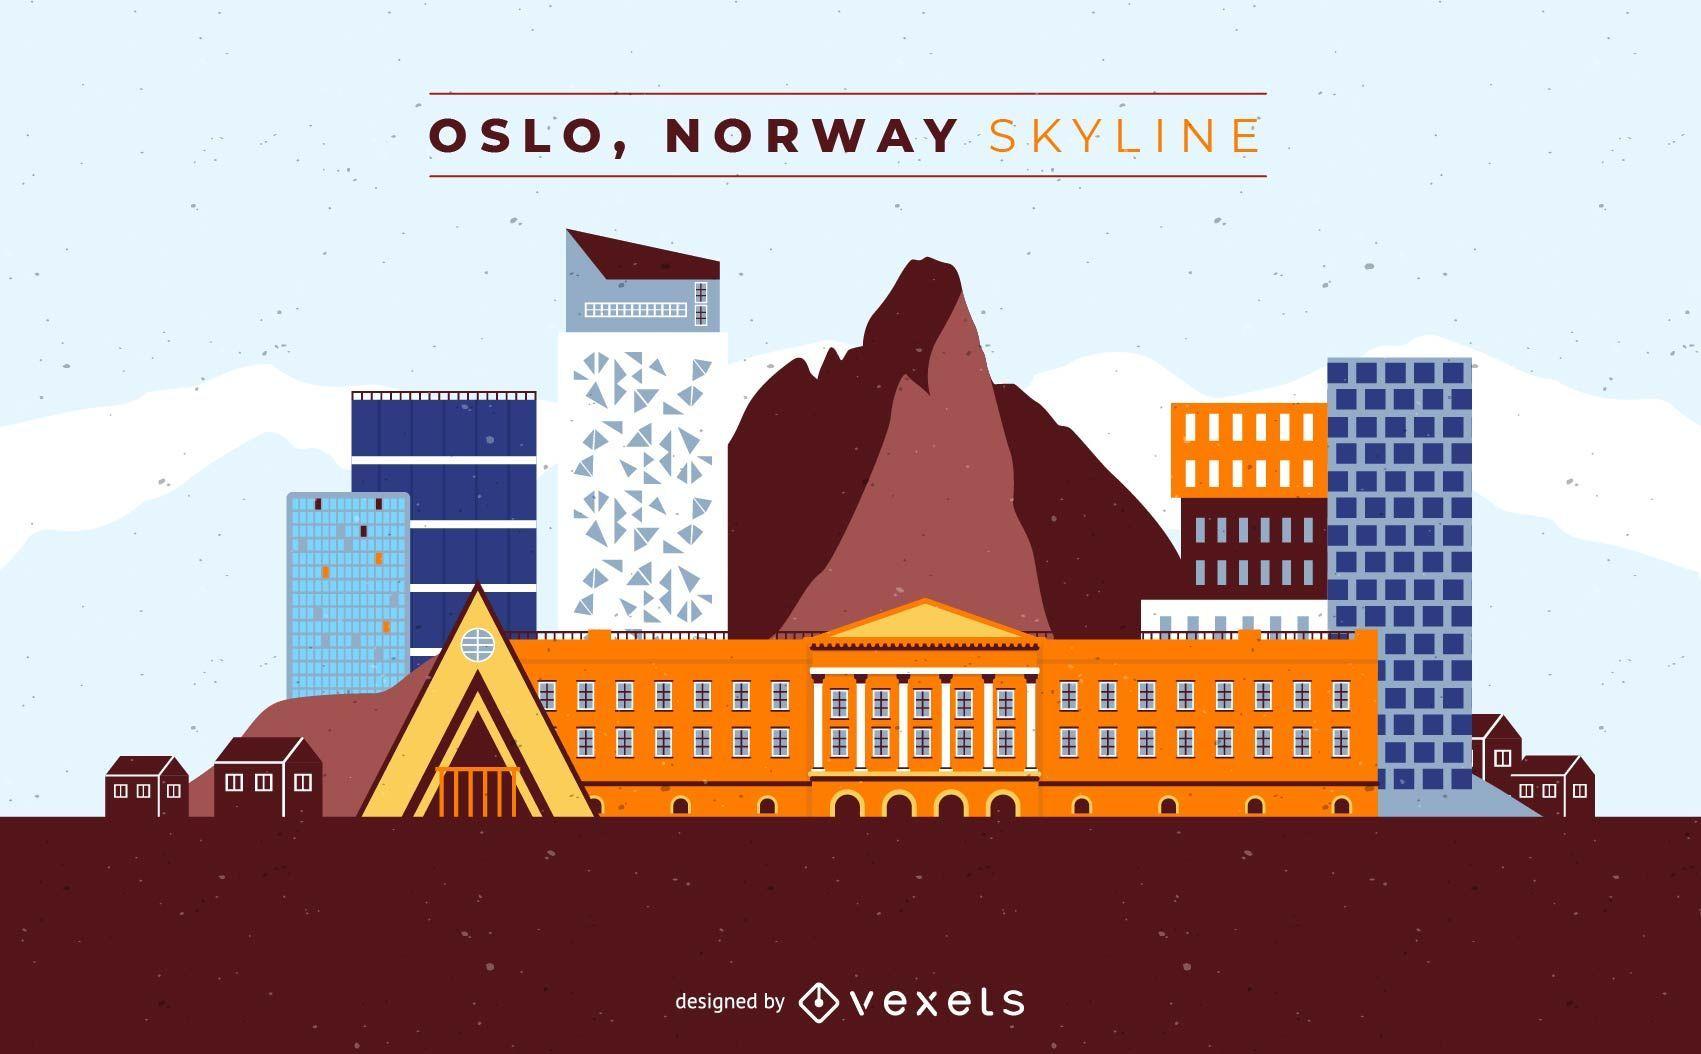 Oslo Norway Skyline